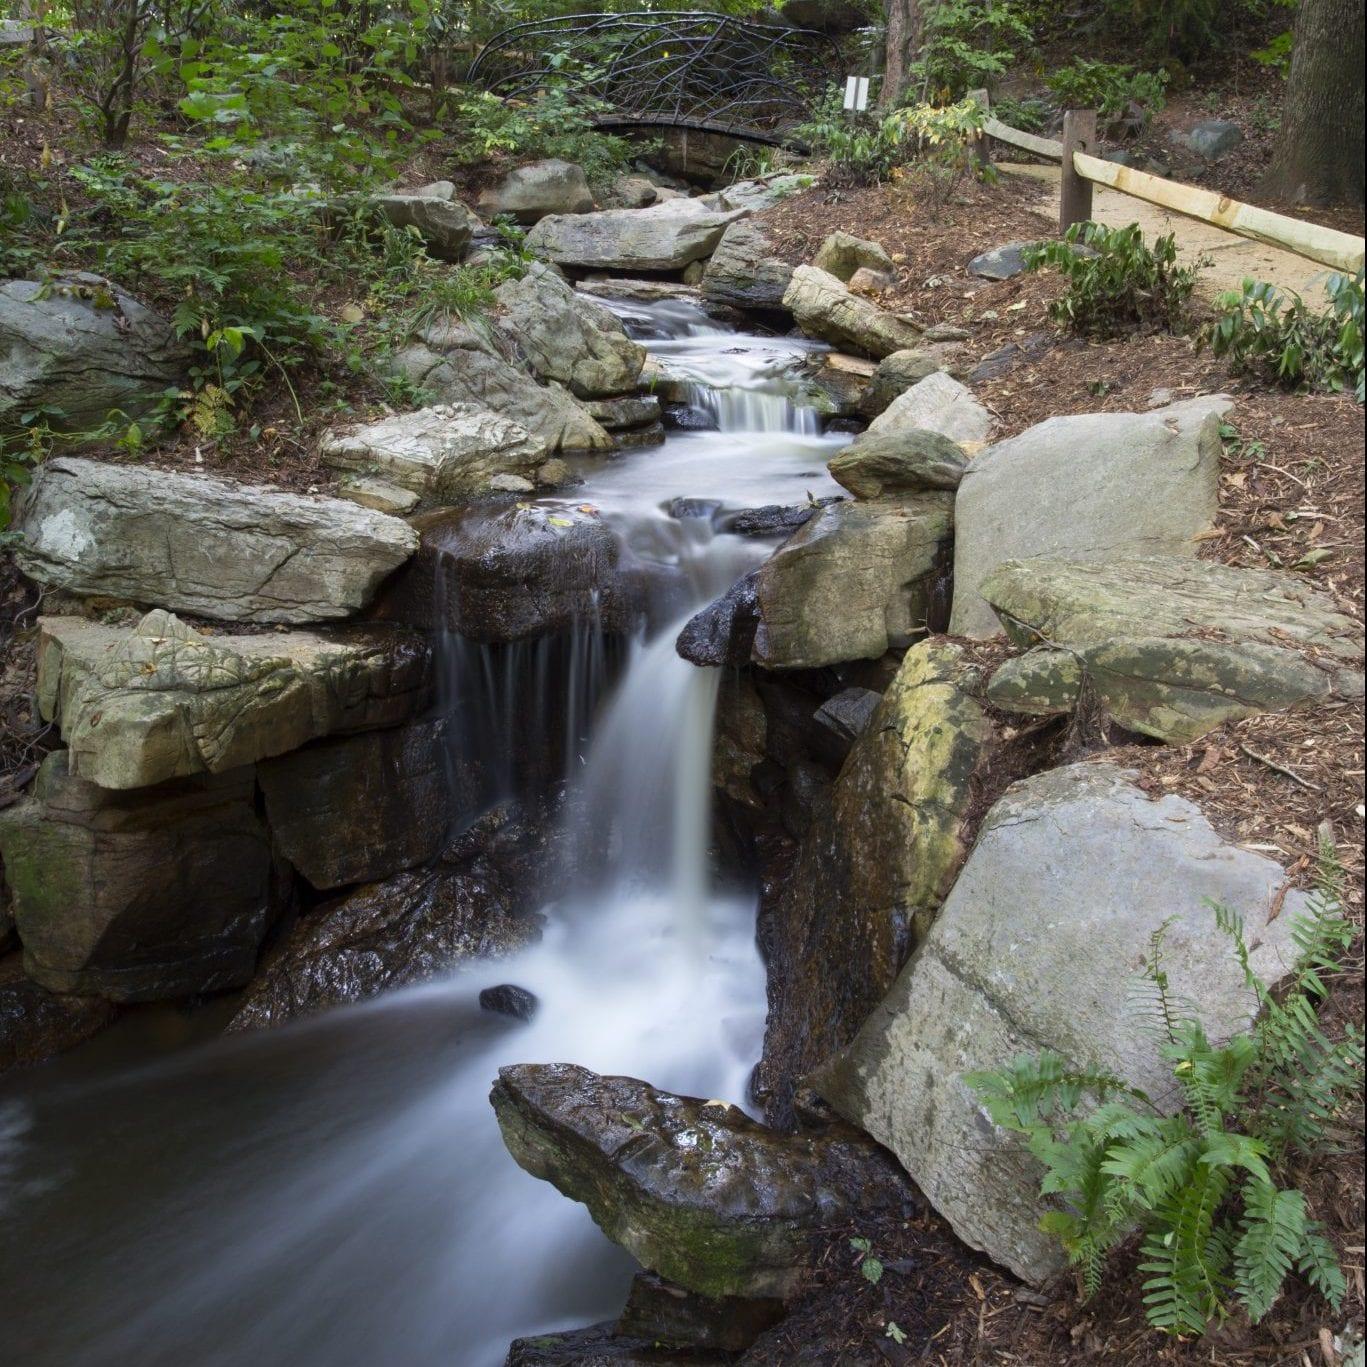 https://greensborobeautiful.org/wp-content/media/Serenity-Falls-3-scaled-e1623309787332.jpeg